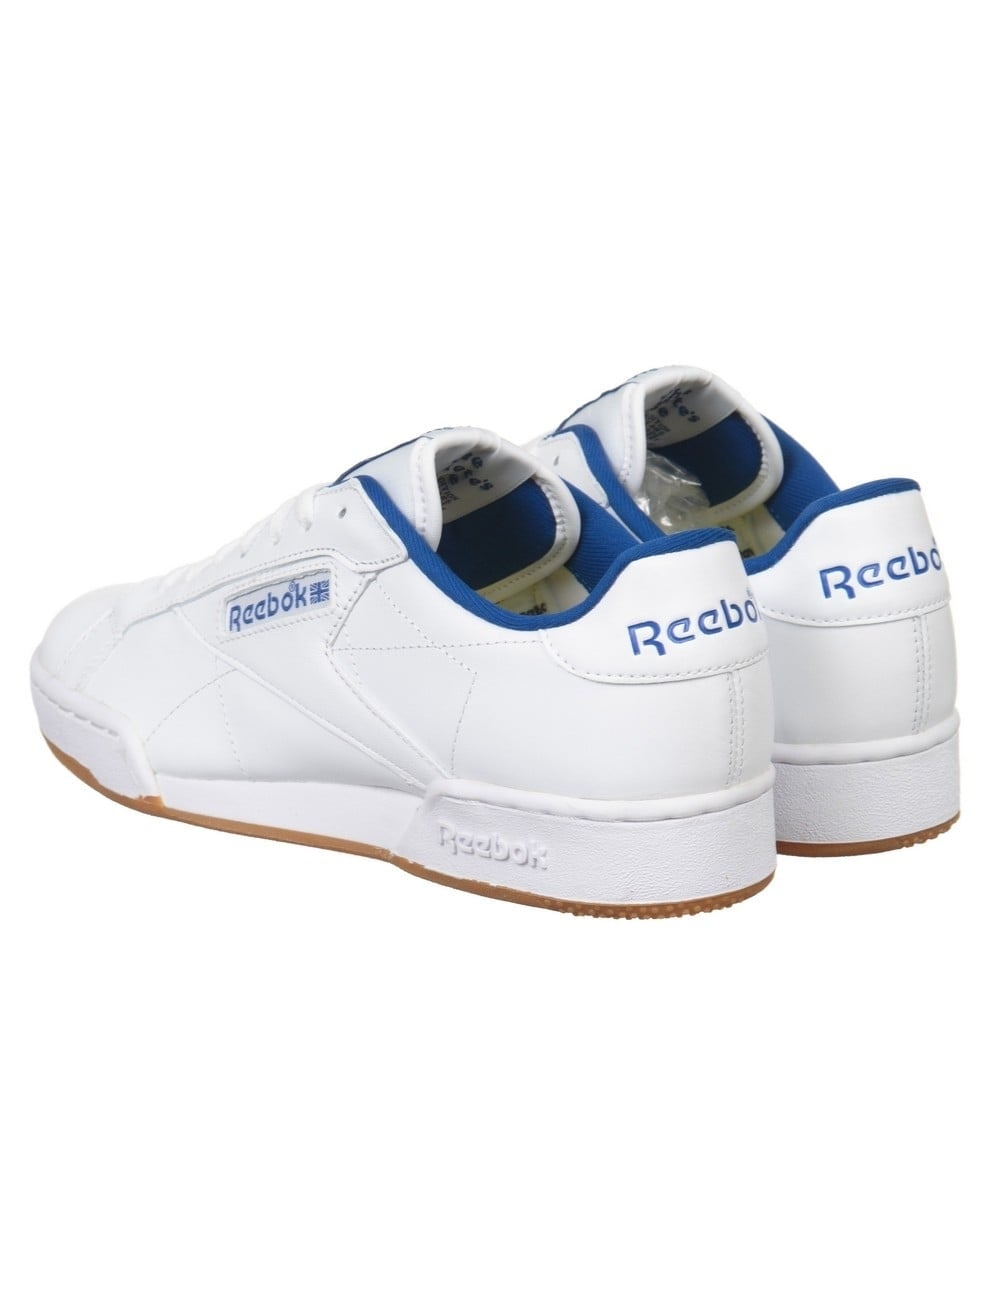 1ec9b4b1 NPC UK II CP Shoes - White/Collegiate Royal/Gum